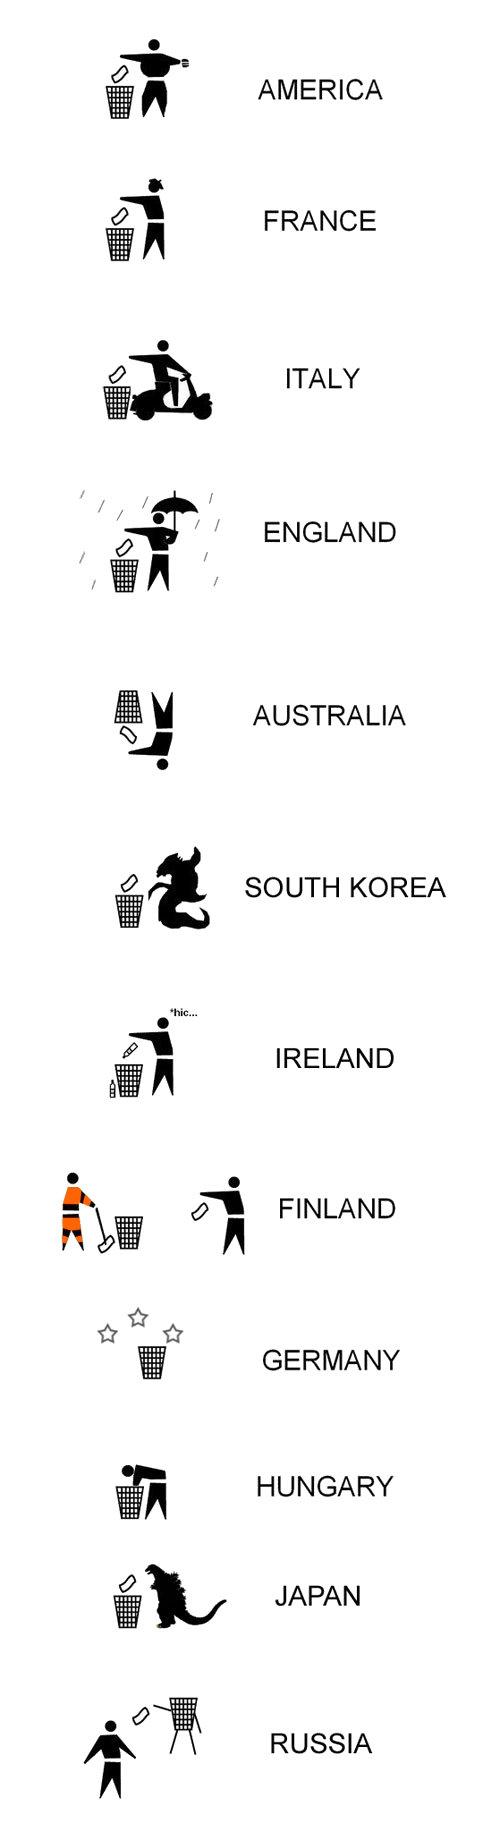 trash. . AMERICA arll d) FRANCE ITALY g' I ENGLAND Atl, 1 E ll AUSTRALIA d? SOUTH KOREA trt; Jr'' IRELAND aw A d' FINLAND MR A Ylt ltr tlt E GERMANY miimii HUNG trash AMERICA arll d) FRANCE ITALY g' I ENGLAND Atl 1 E ll AUSTRALIA d? SOUTH KOREA trt; Jr'' IRELAND aw A d' FINLAND MR Ylt ltr tlt GERMANY miimii HUNG